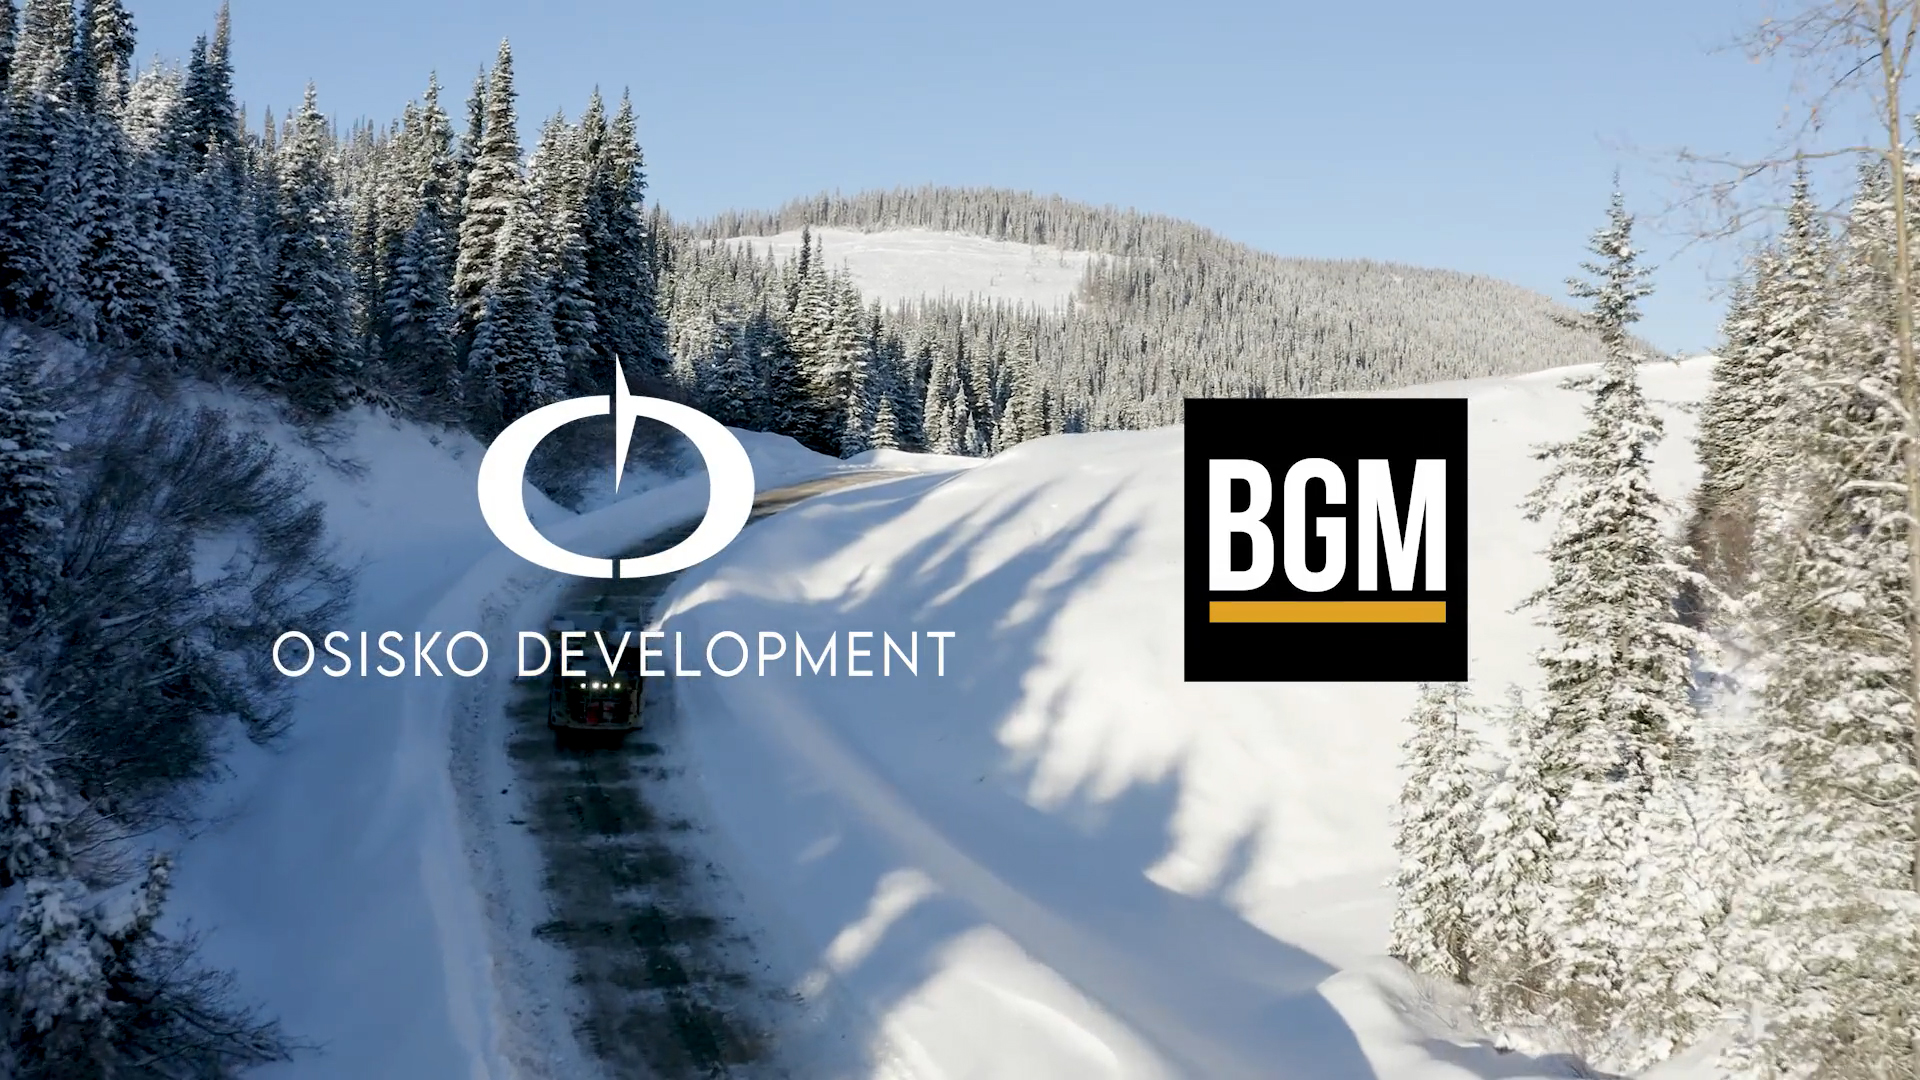 Osisko Development logo BGM logo